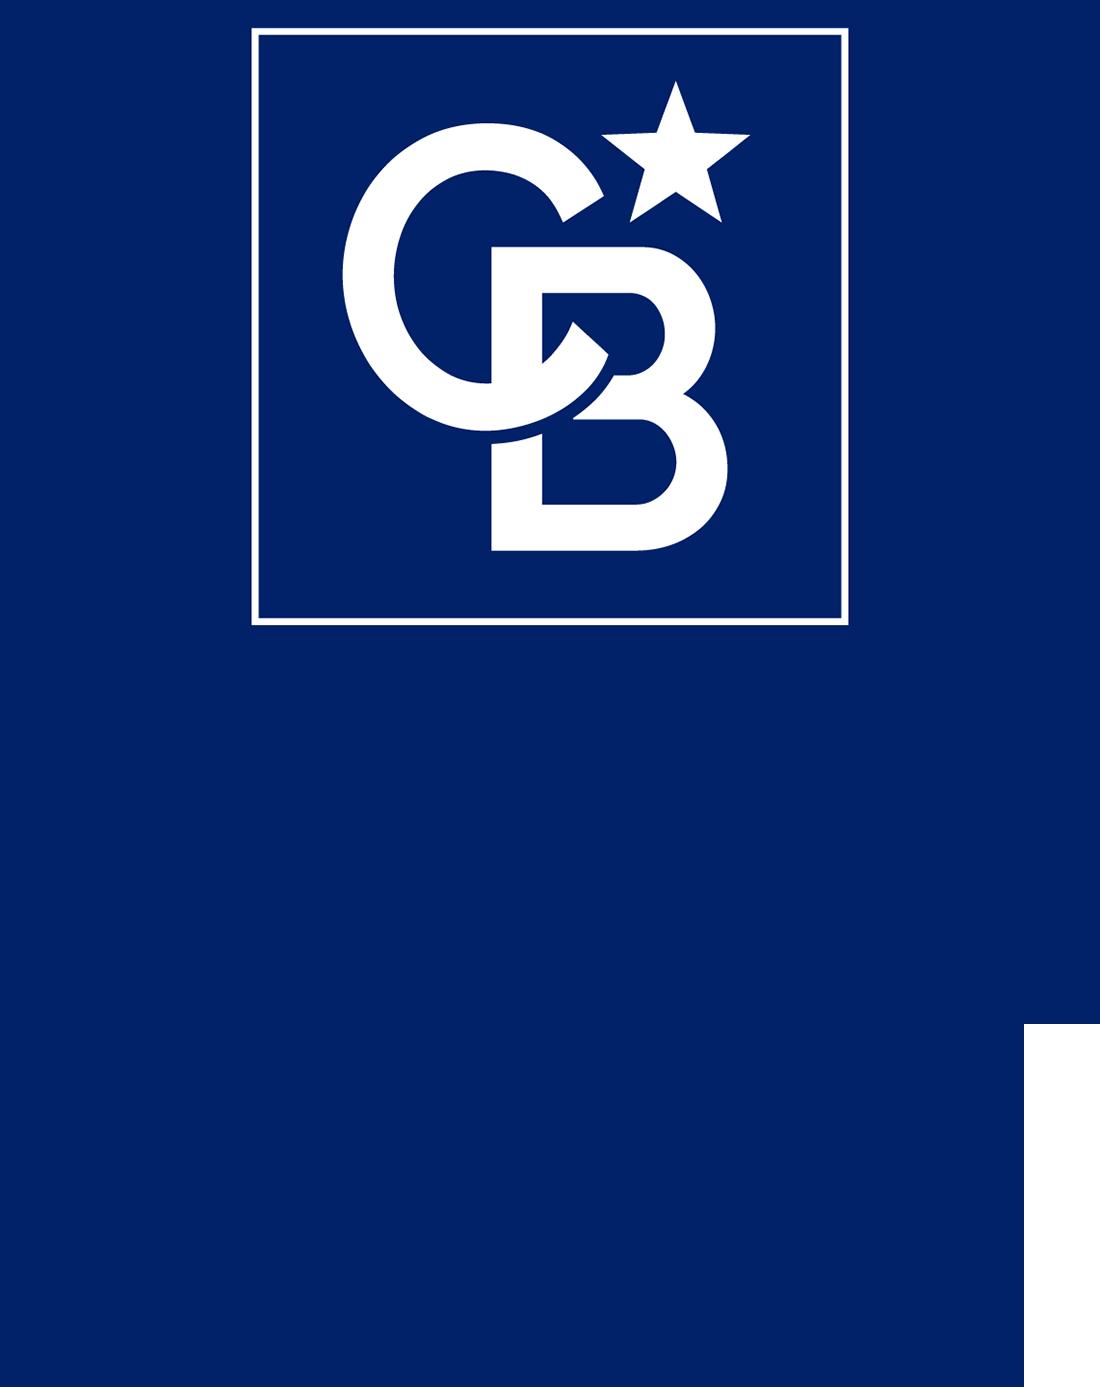 cbip24 Logo